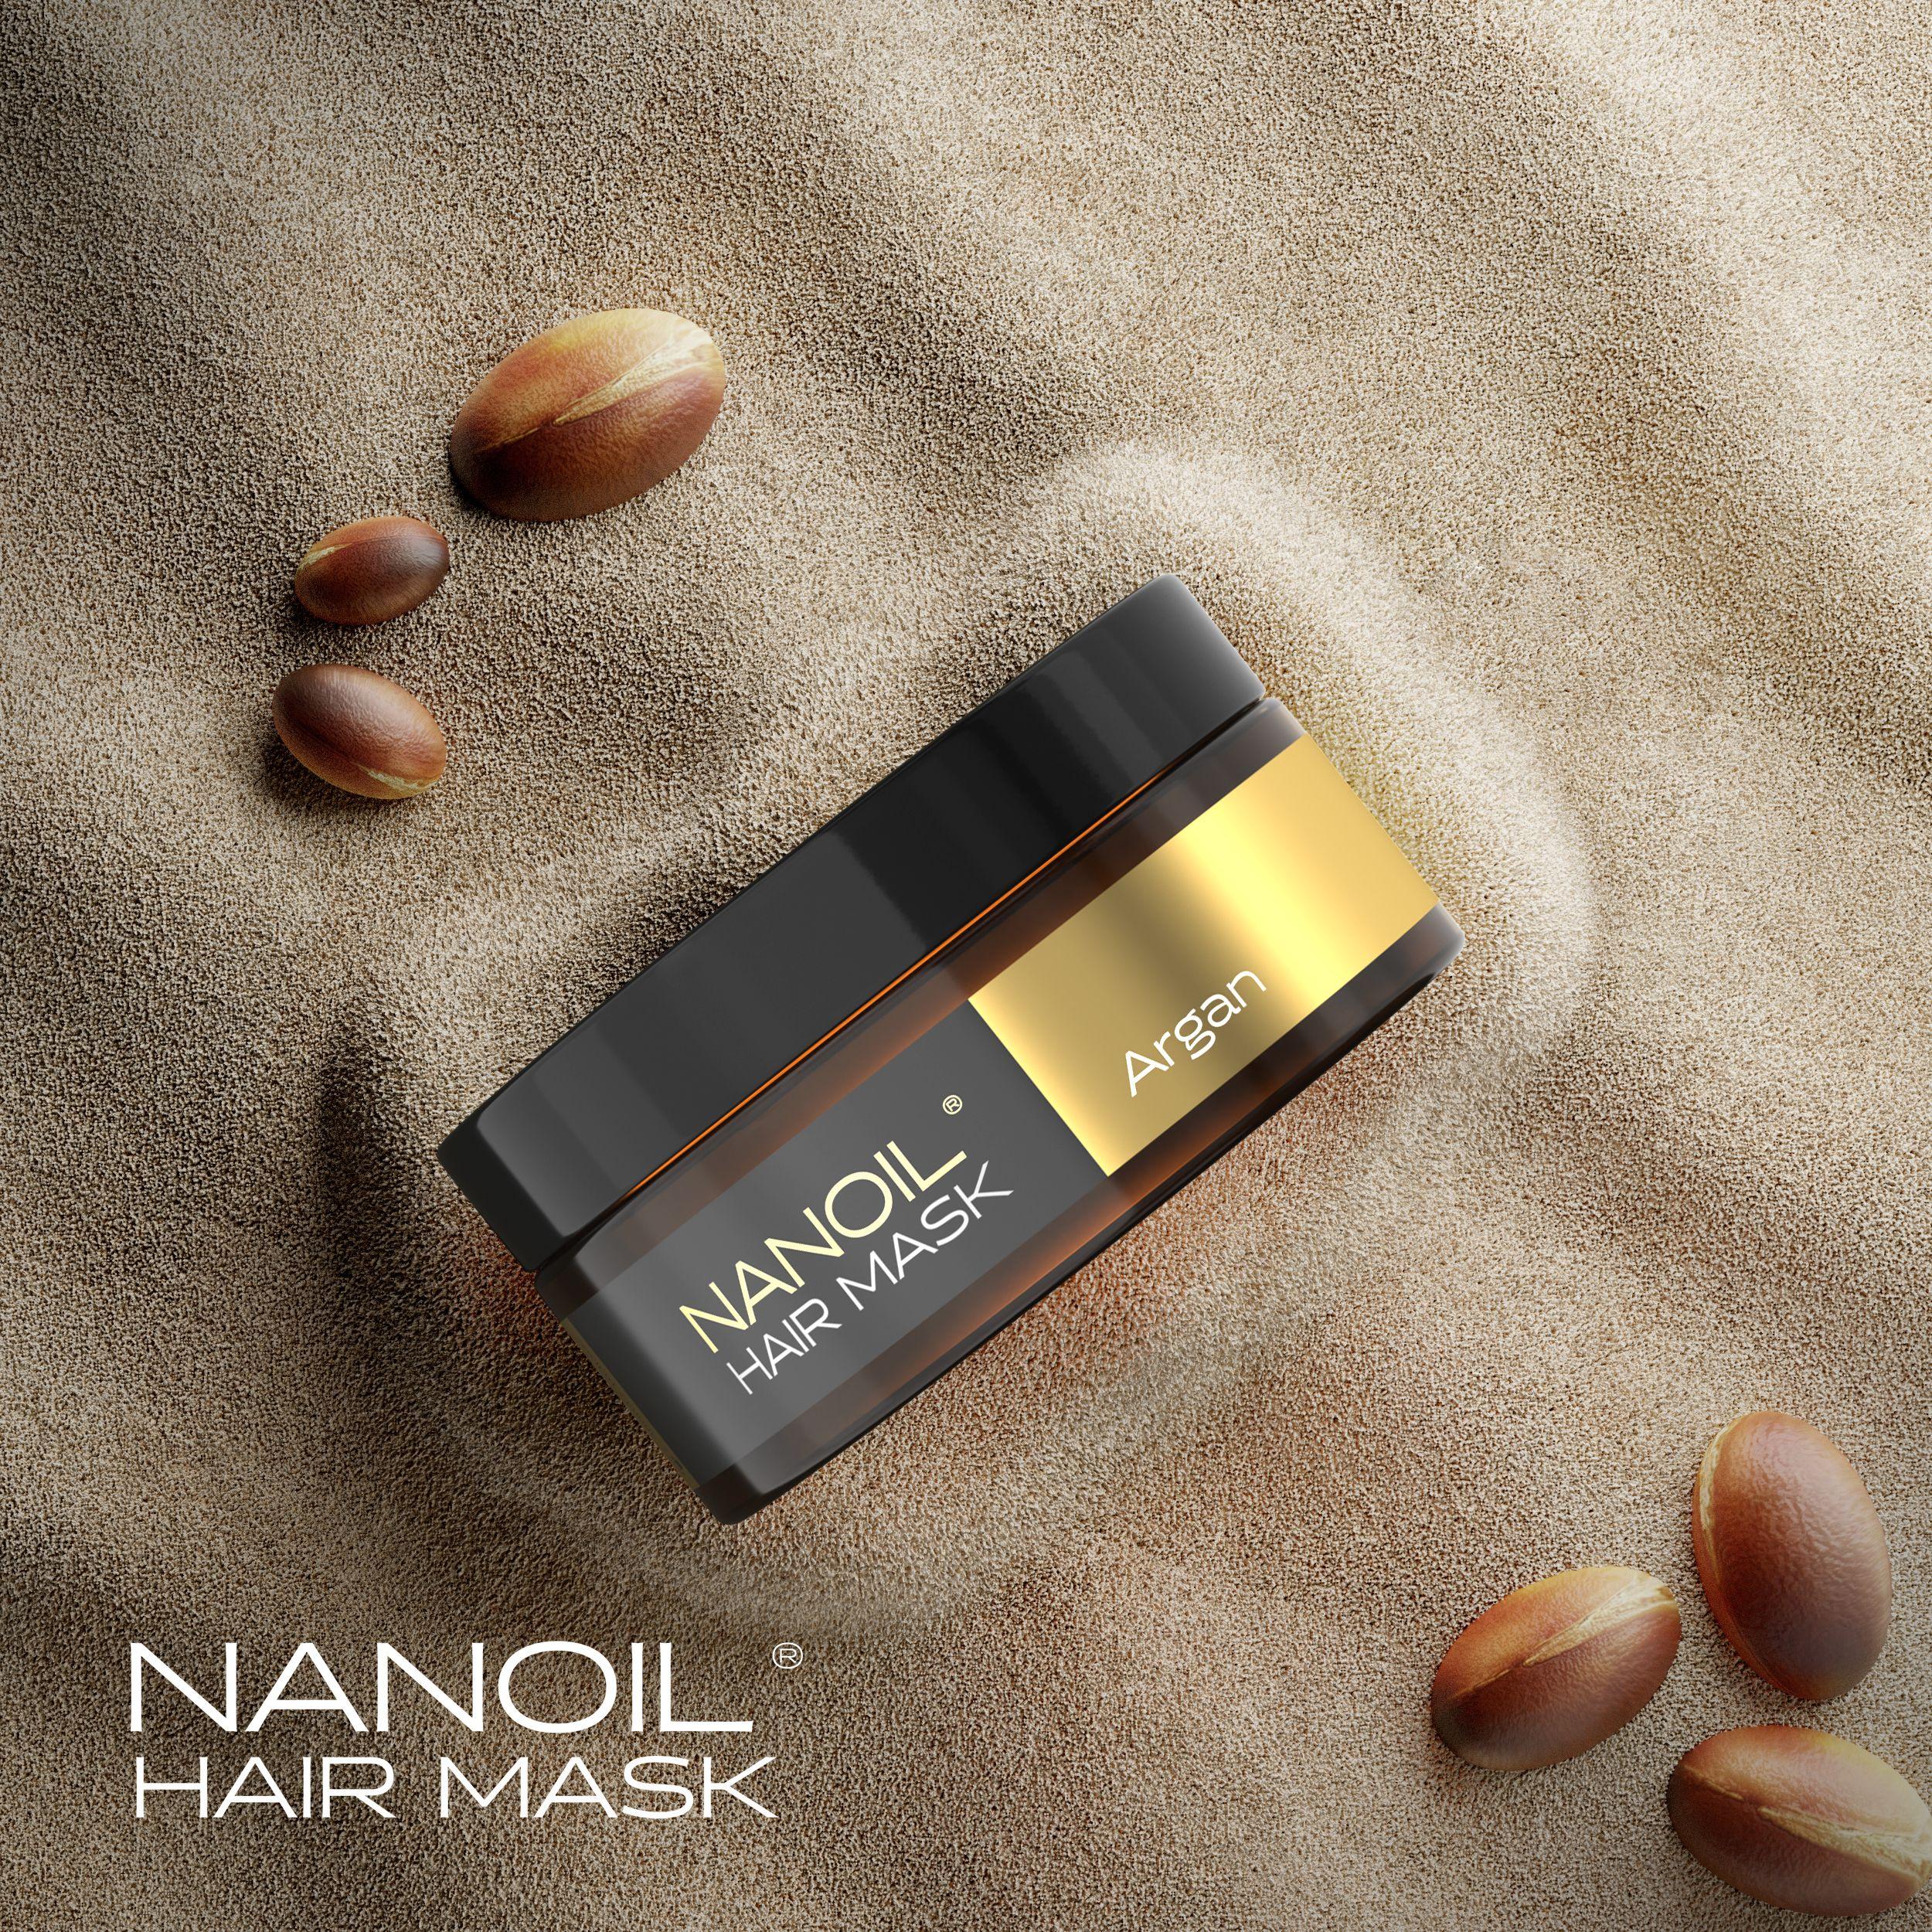 Nanoil Arganöl Haarmaske